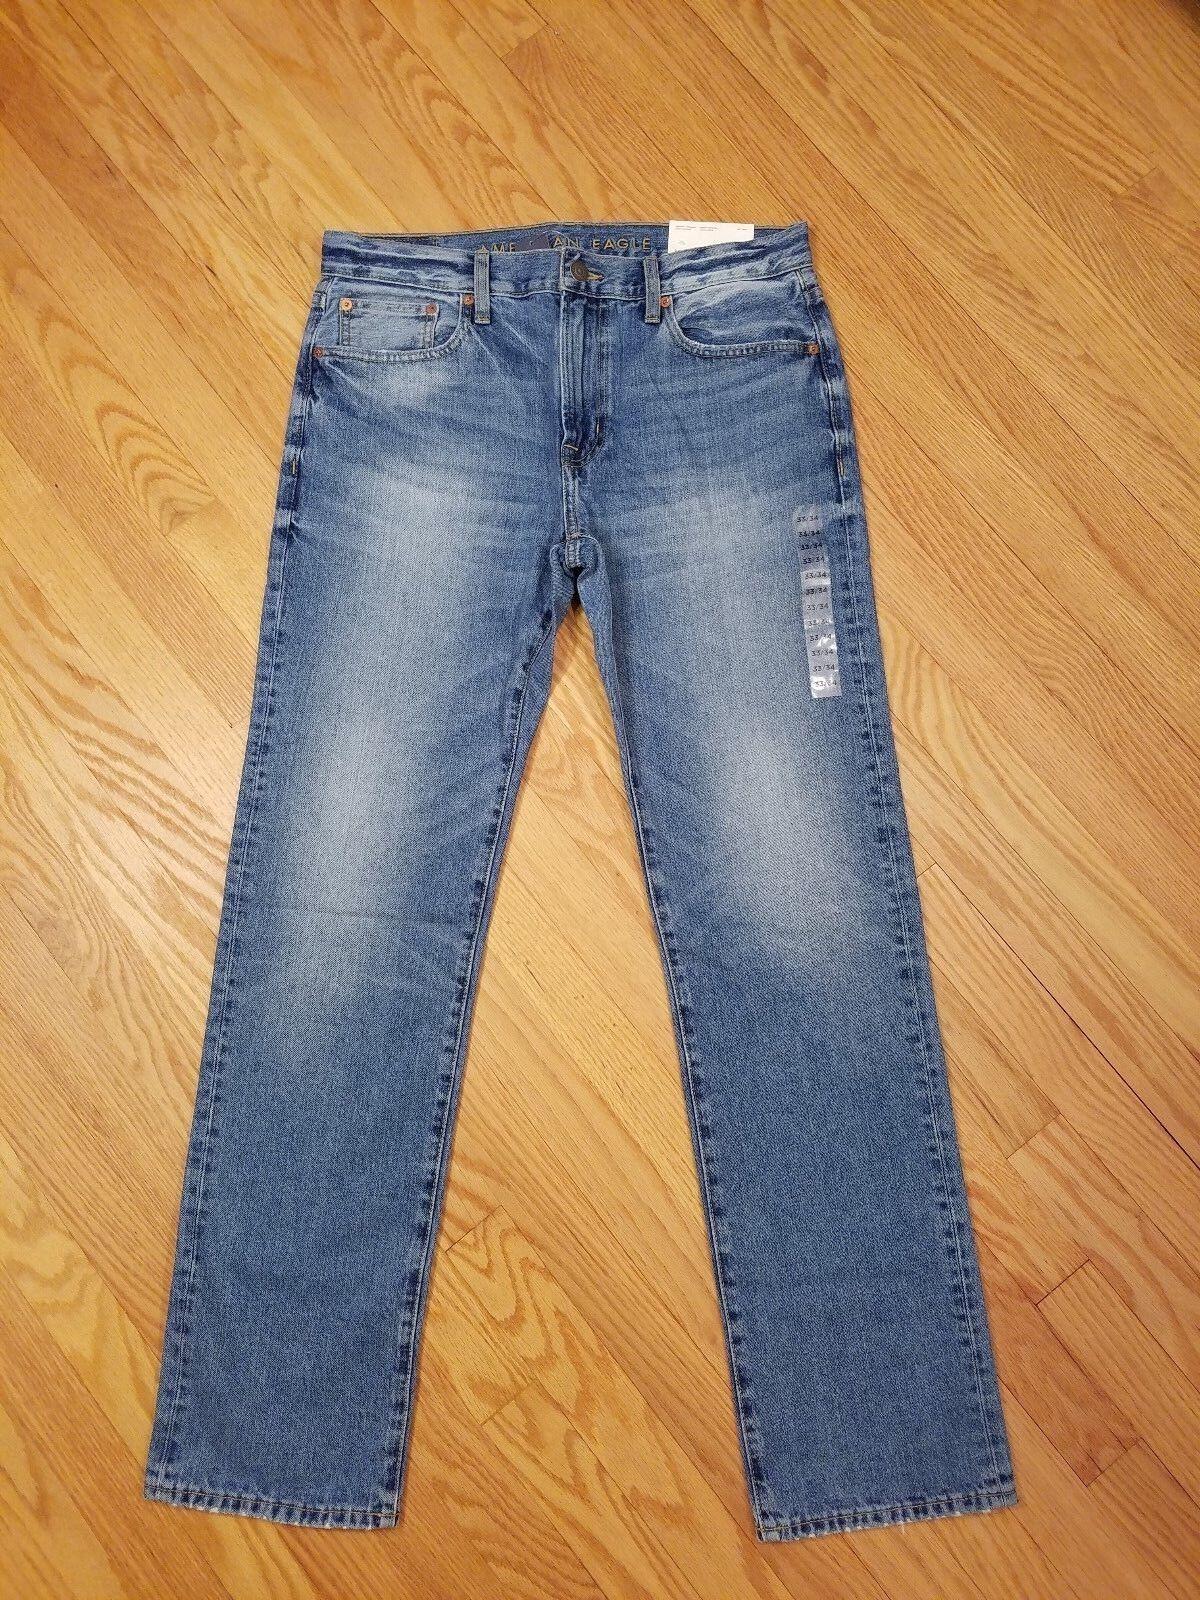 Mens NEW AE American Eagle Original Straight Light Vintage Denim Jeans 33 X 34